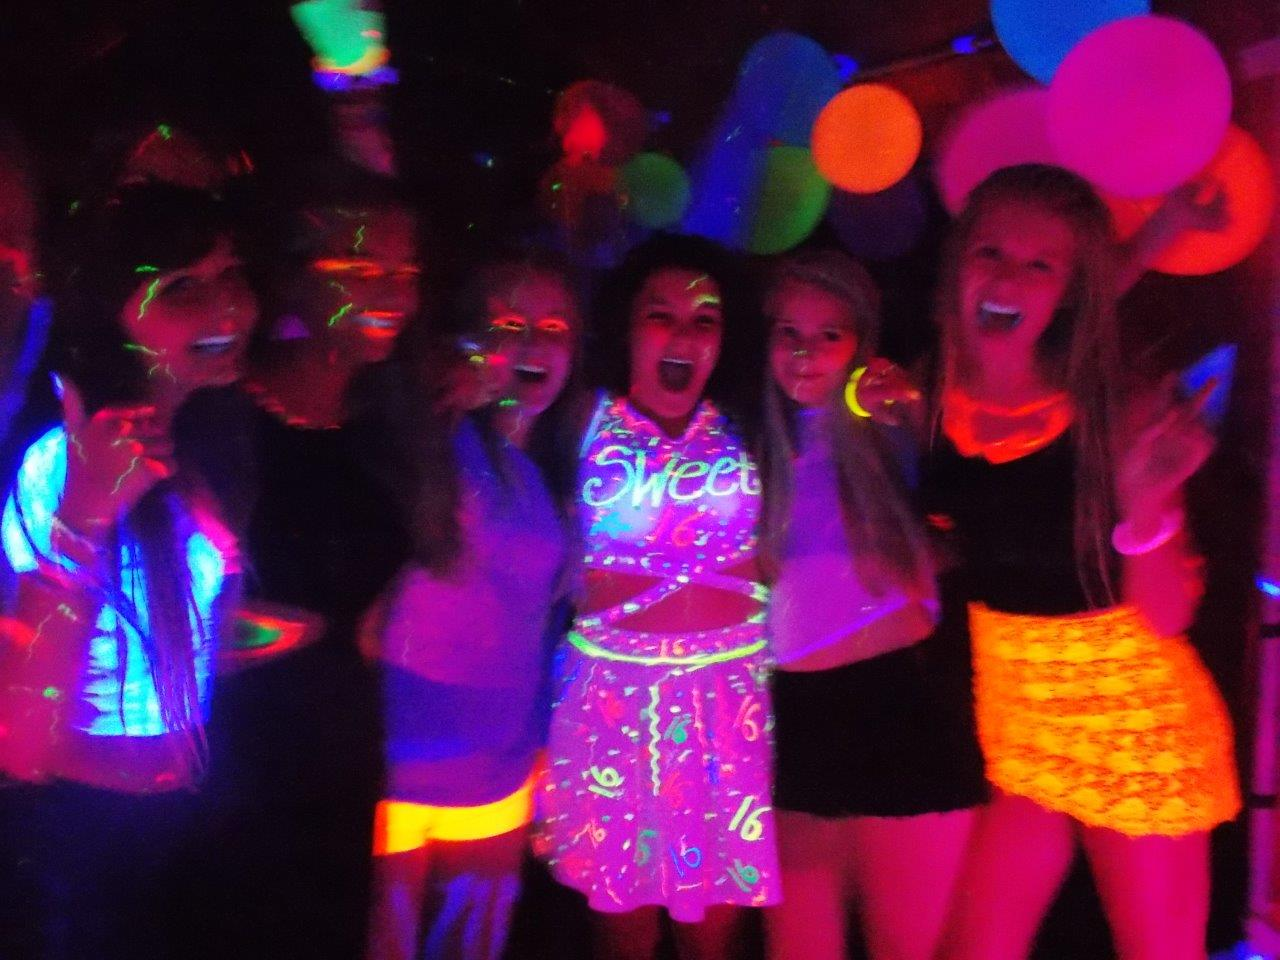 dj petrecere de copii kids party